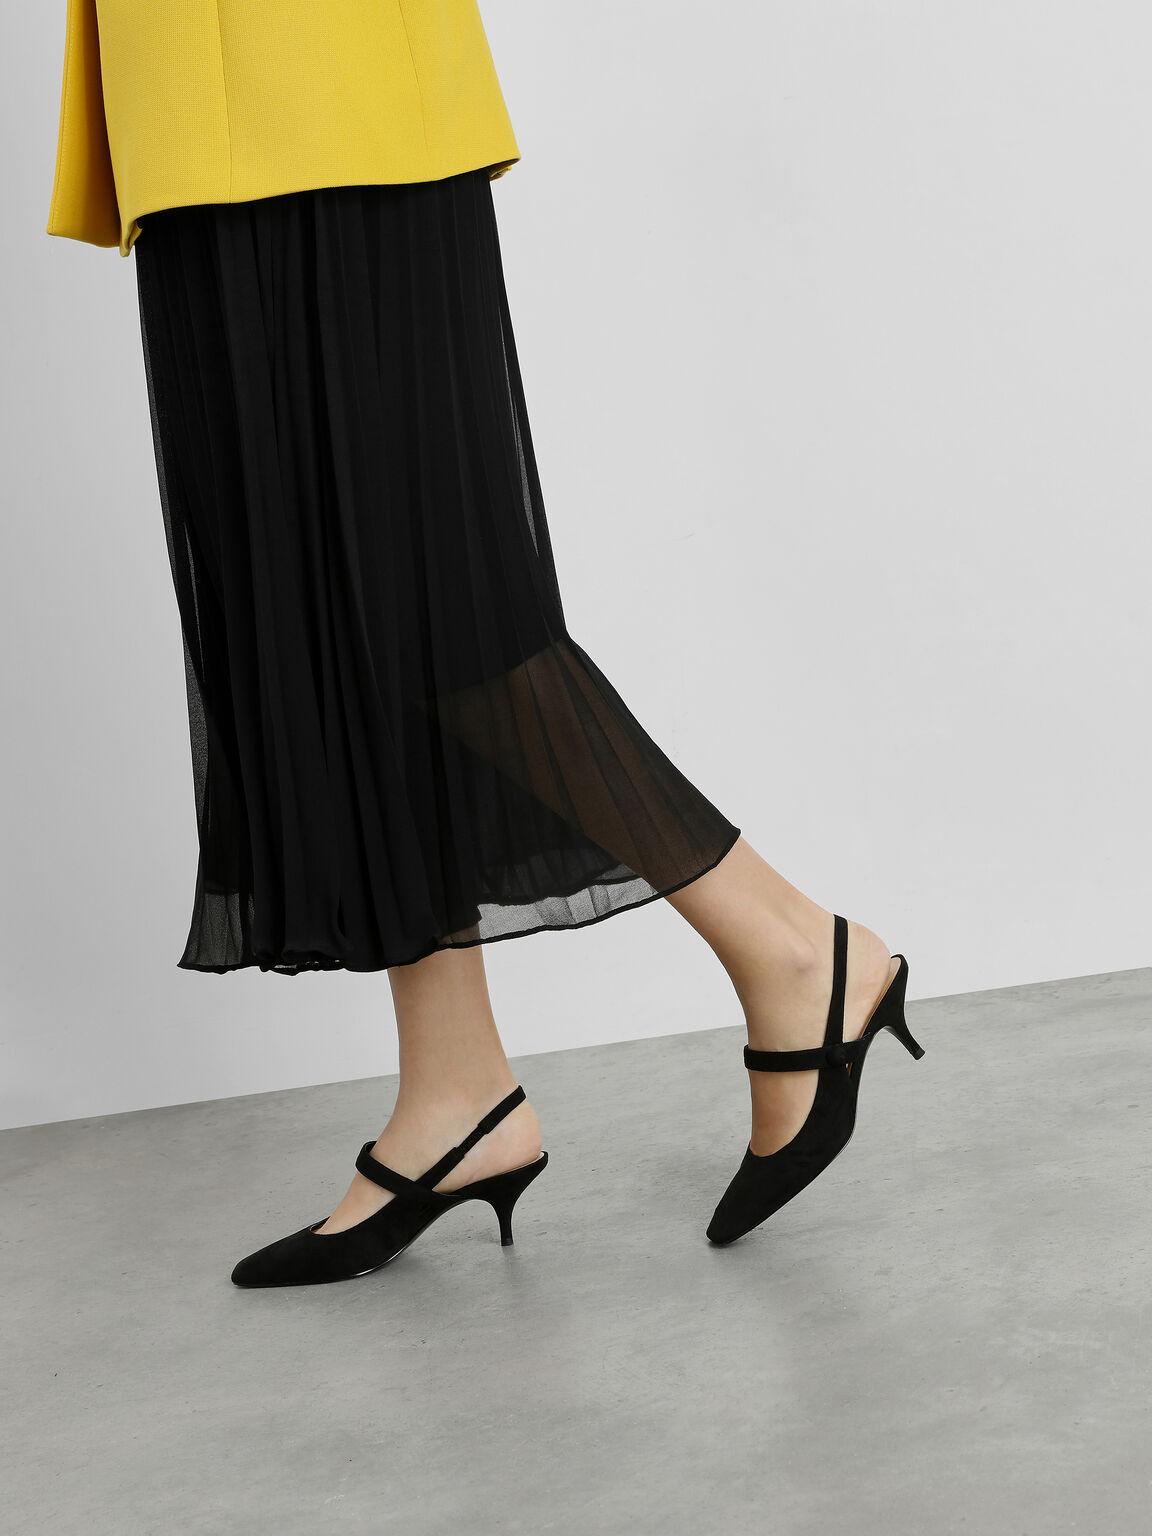 Square Toe Mary Jane Slingback Heels, Black, hi-res